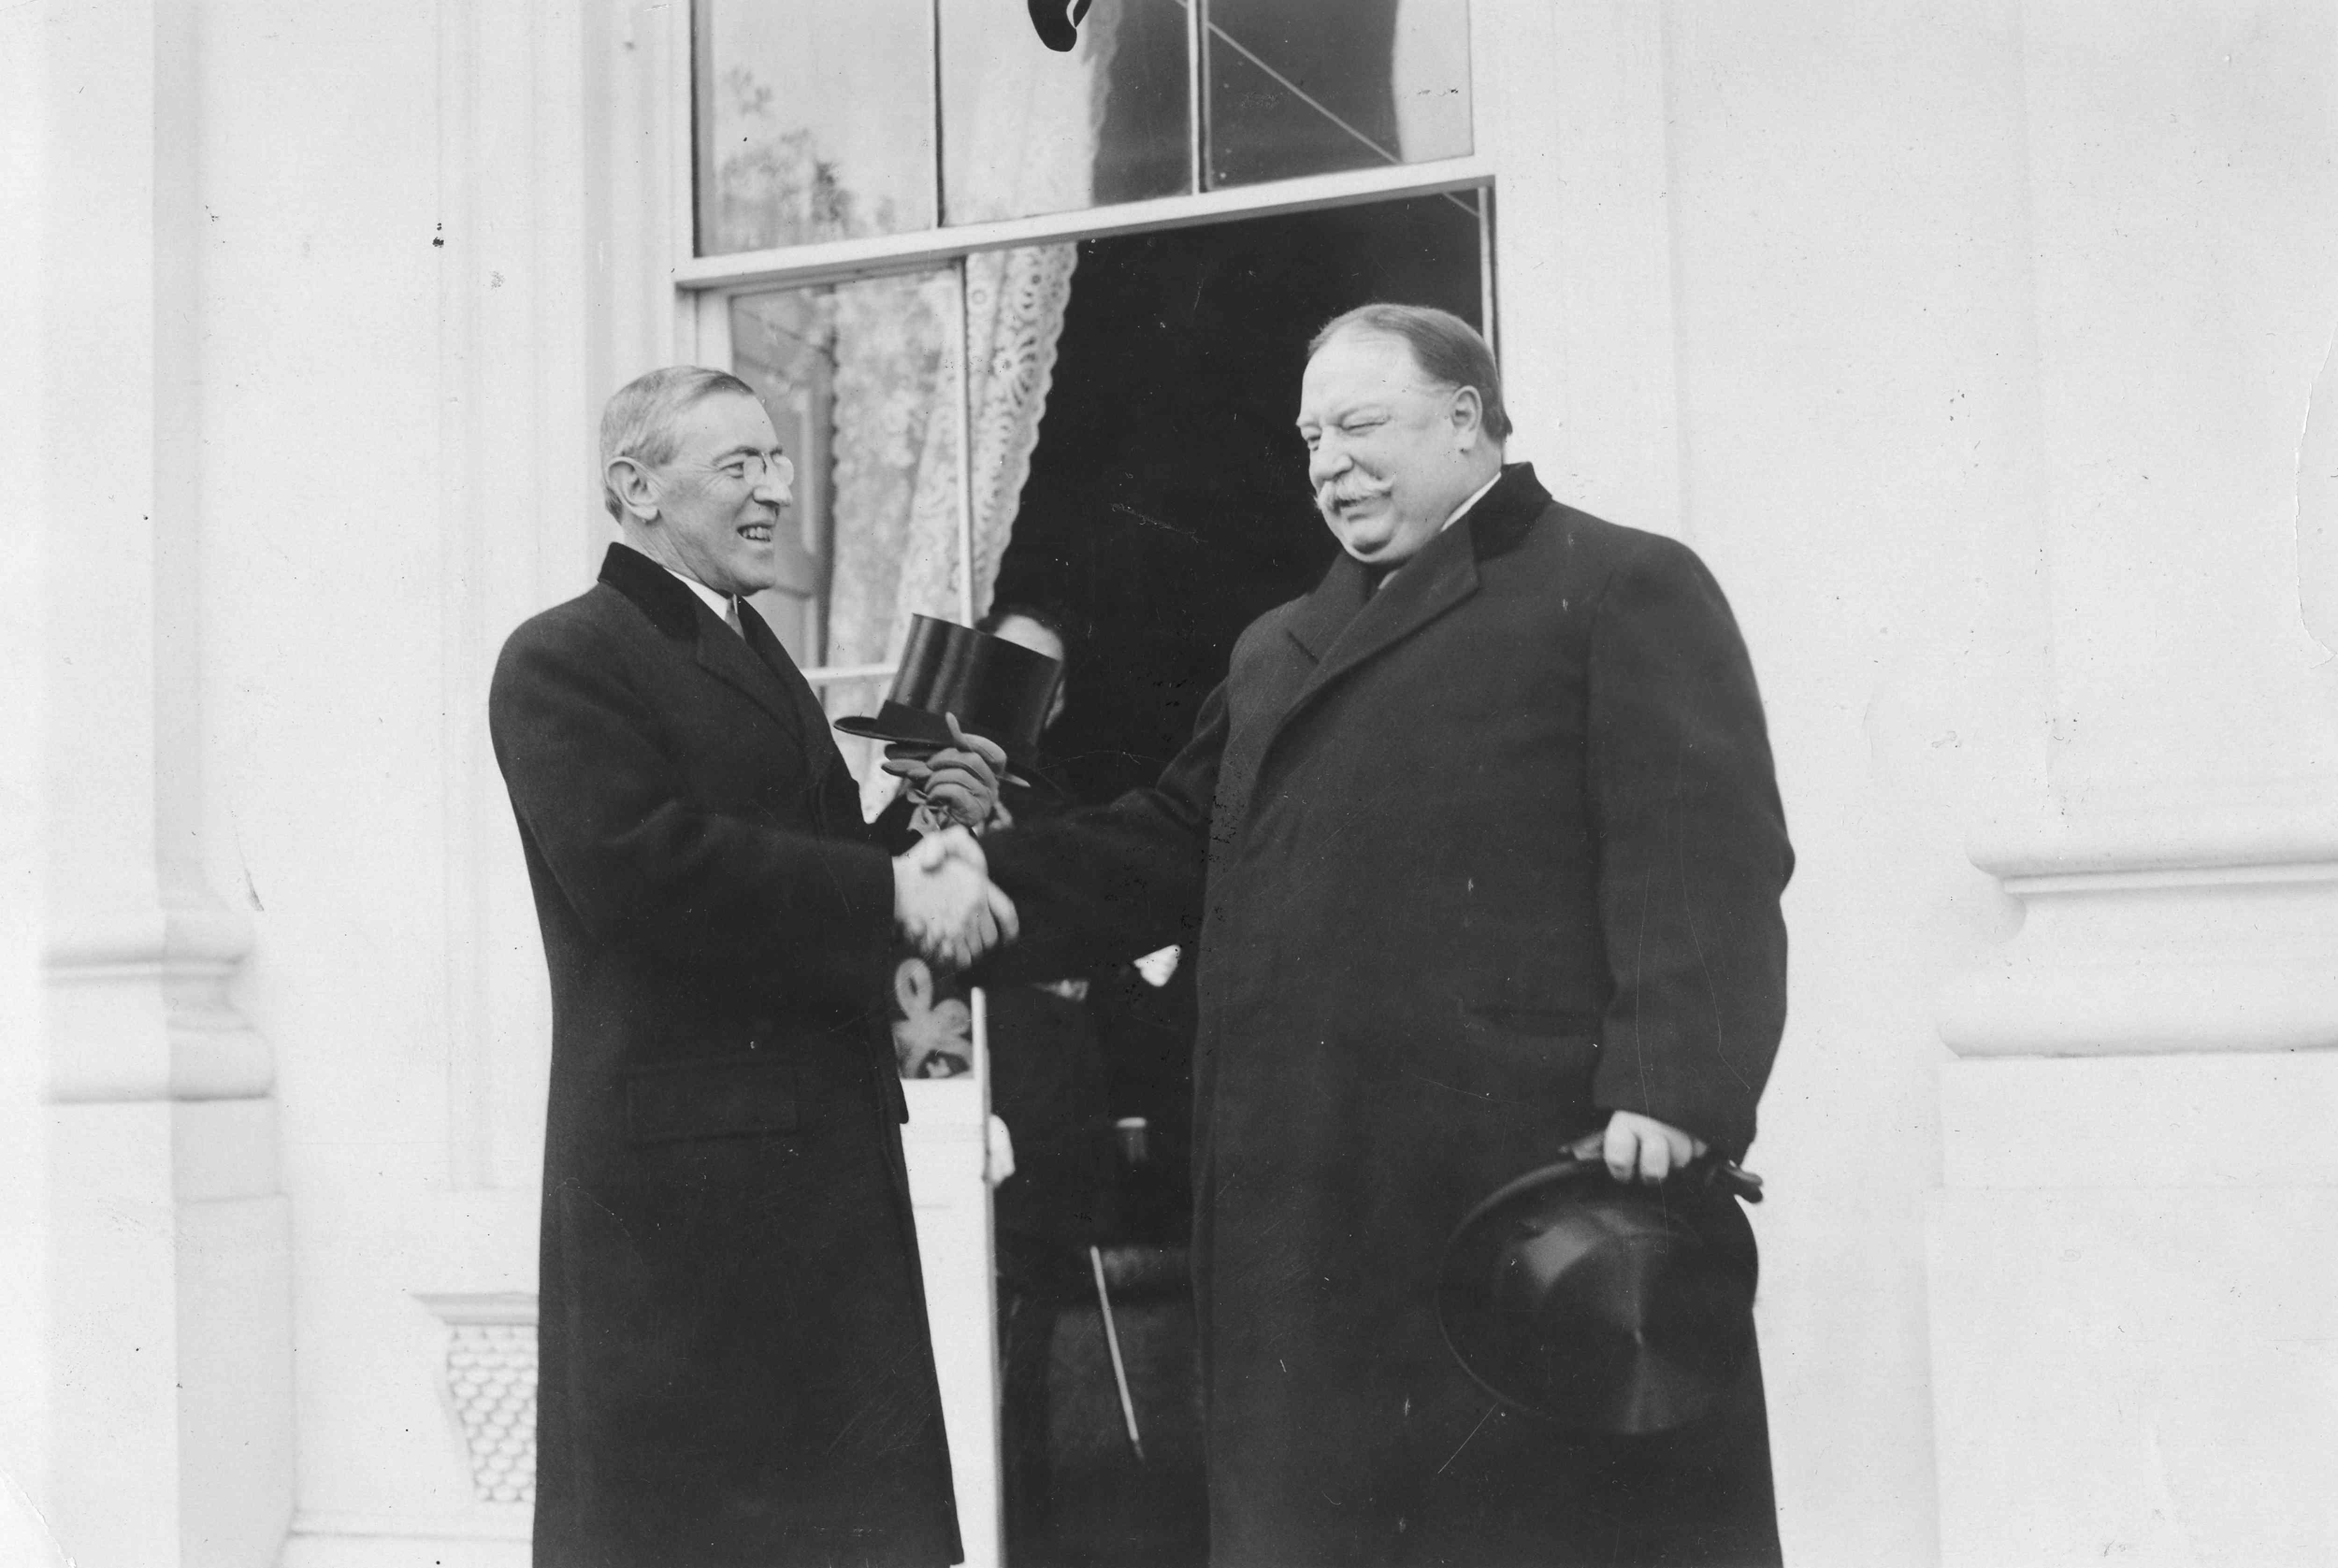 At The Wilson Inauguration